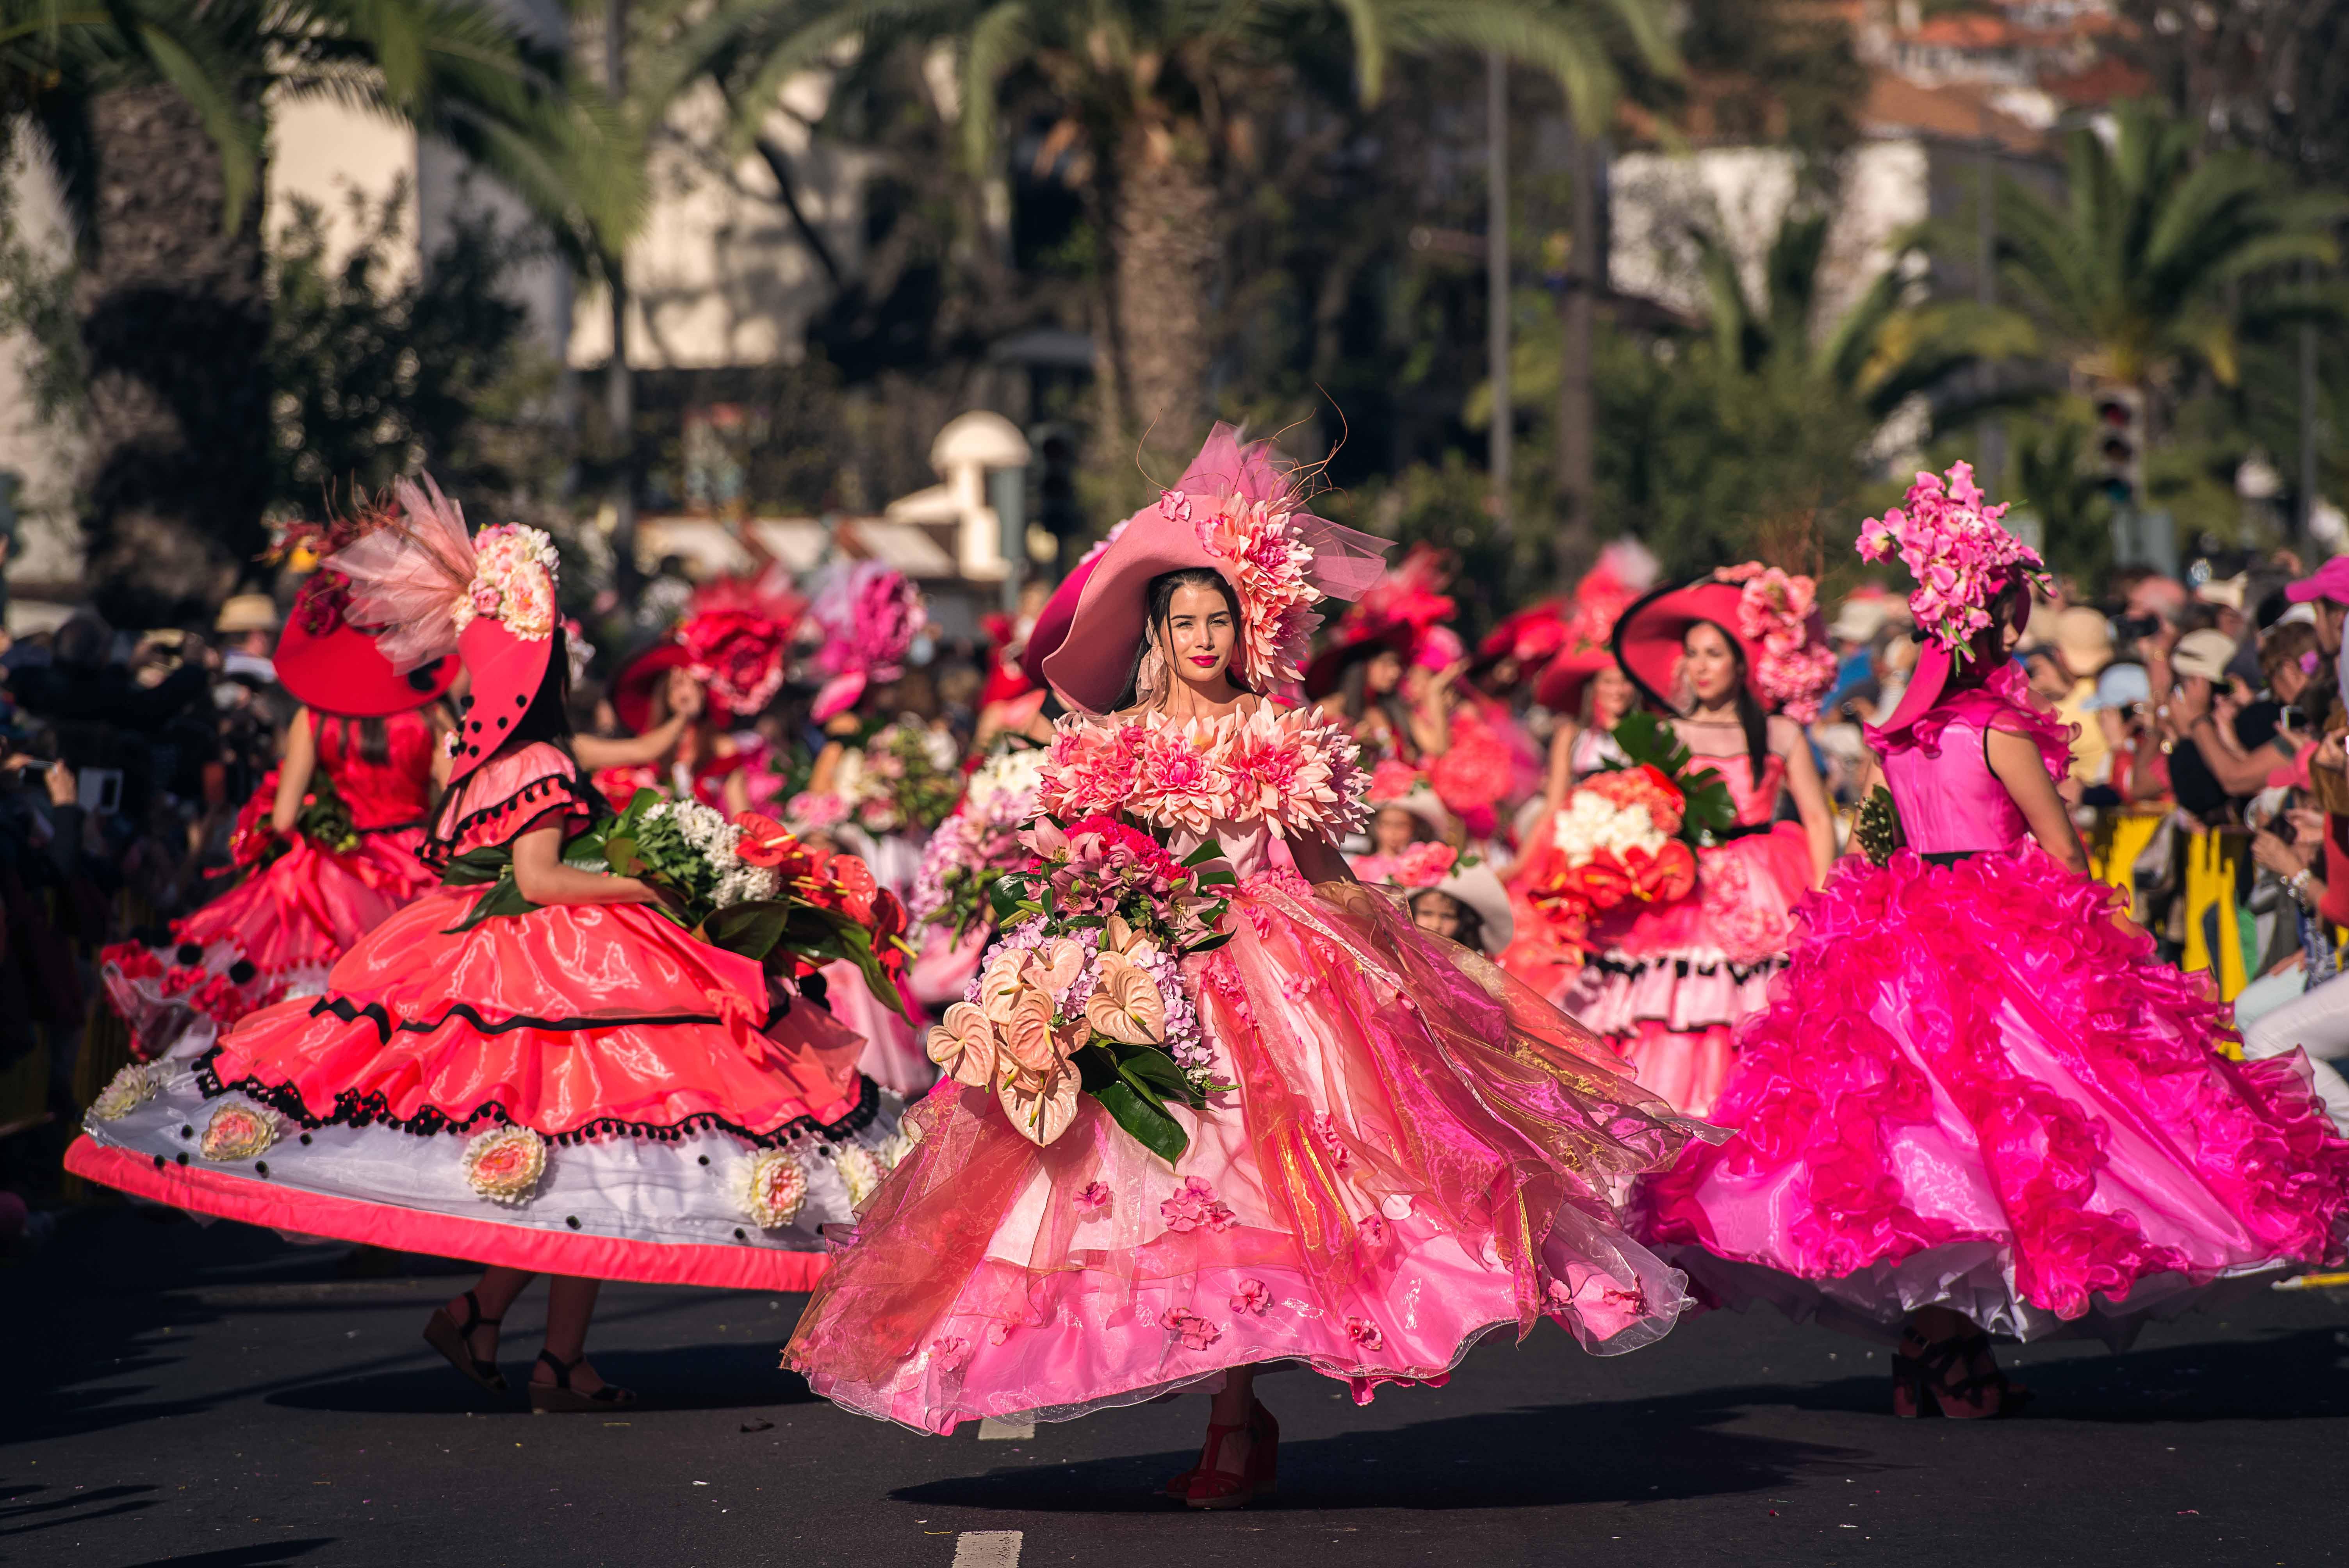 Desfile durante a Festa da Flor, na Ilha da Madeira_ Crédito - Francisco Correia